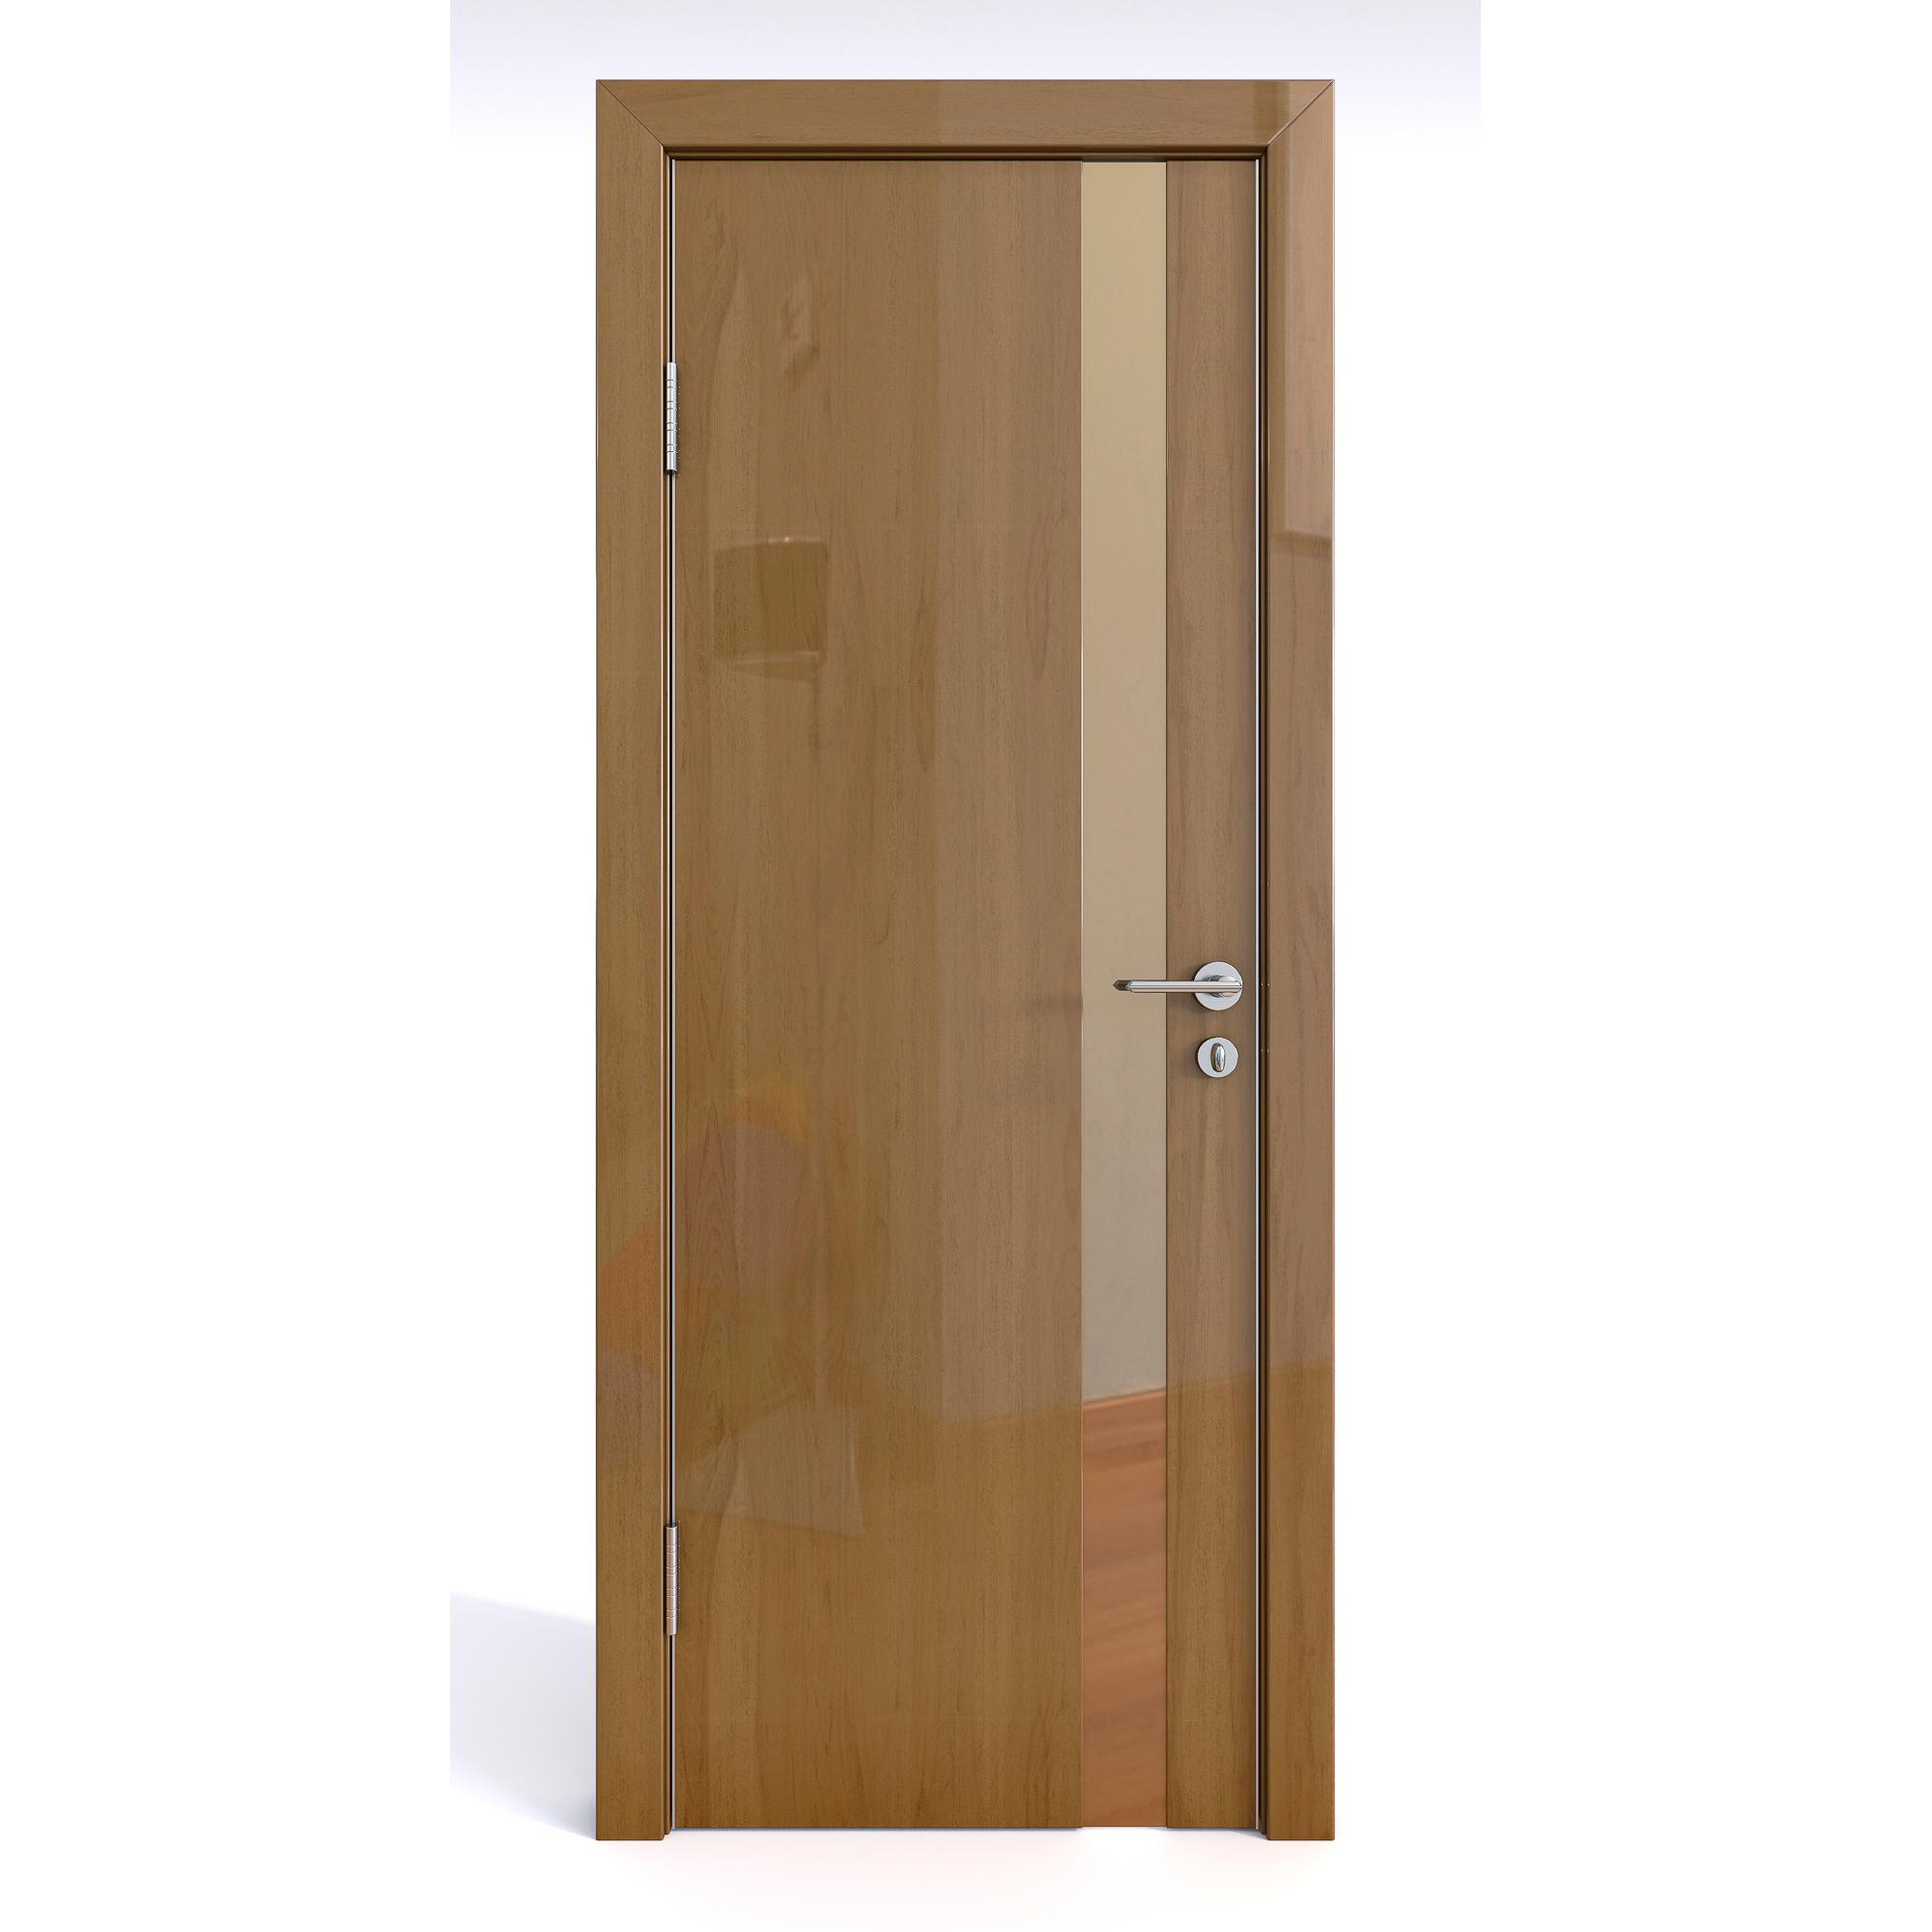 Межкомнатная дверь ДО-507 Анегри темный глянец/бронза 200х60 фото